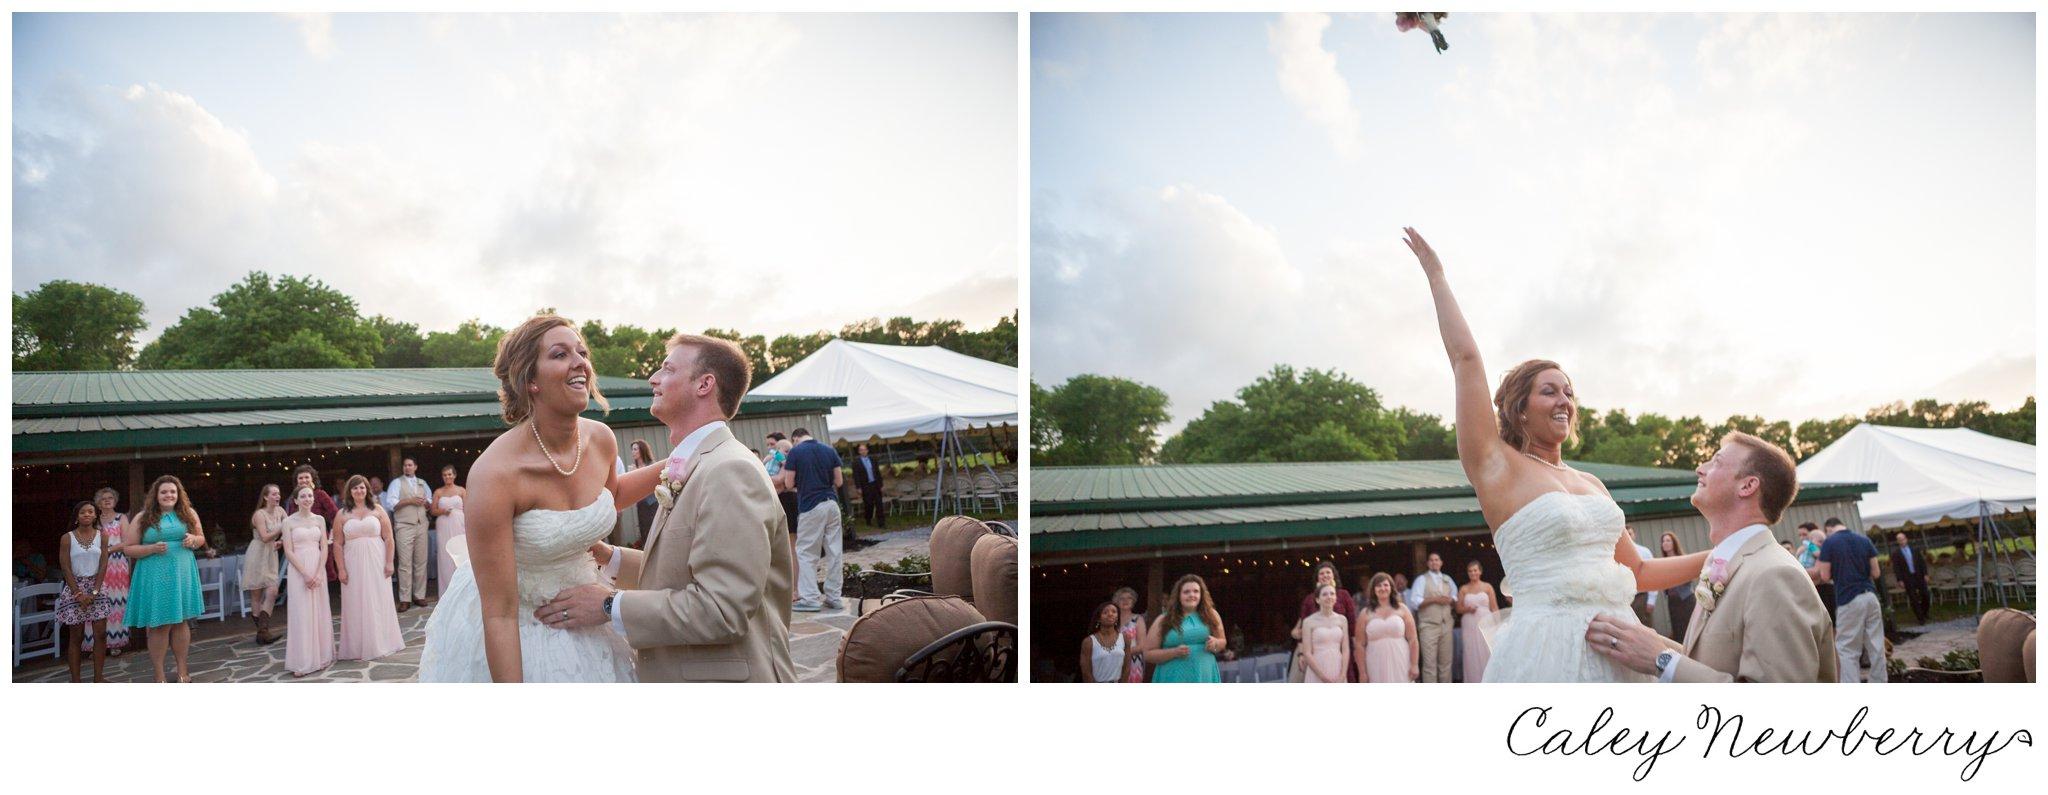 wedding-reception-photography-terian-farms.jpg